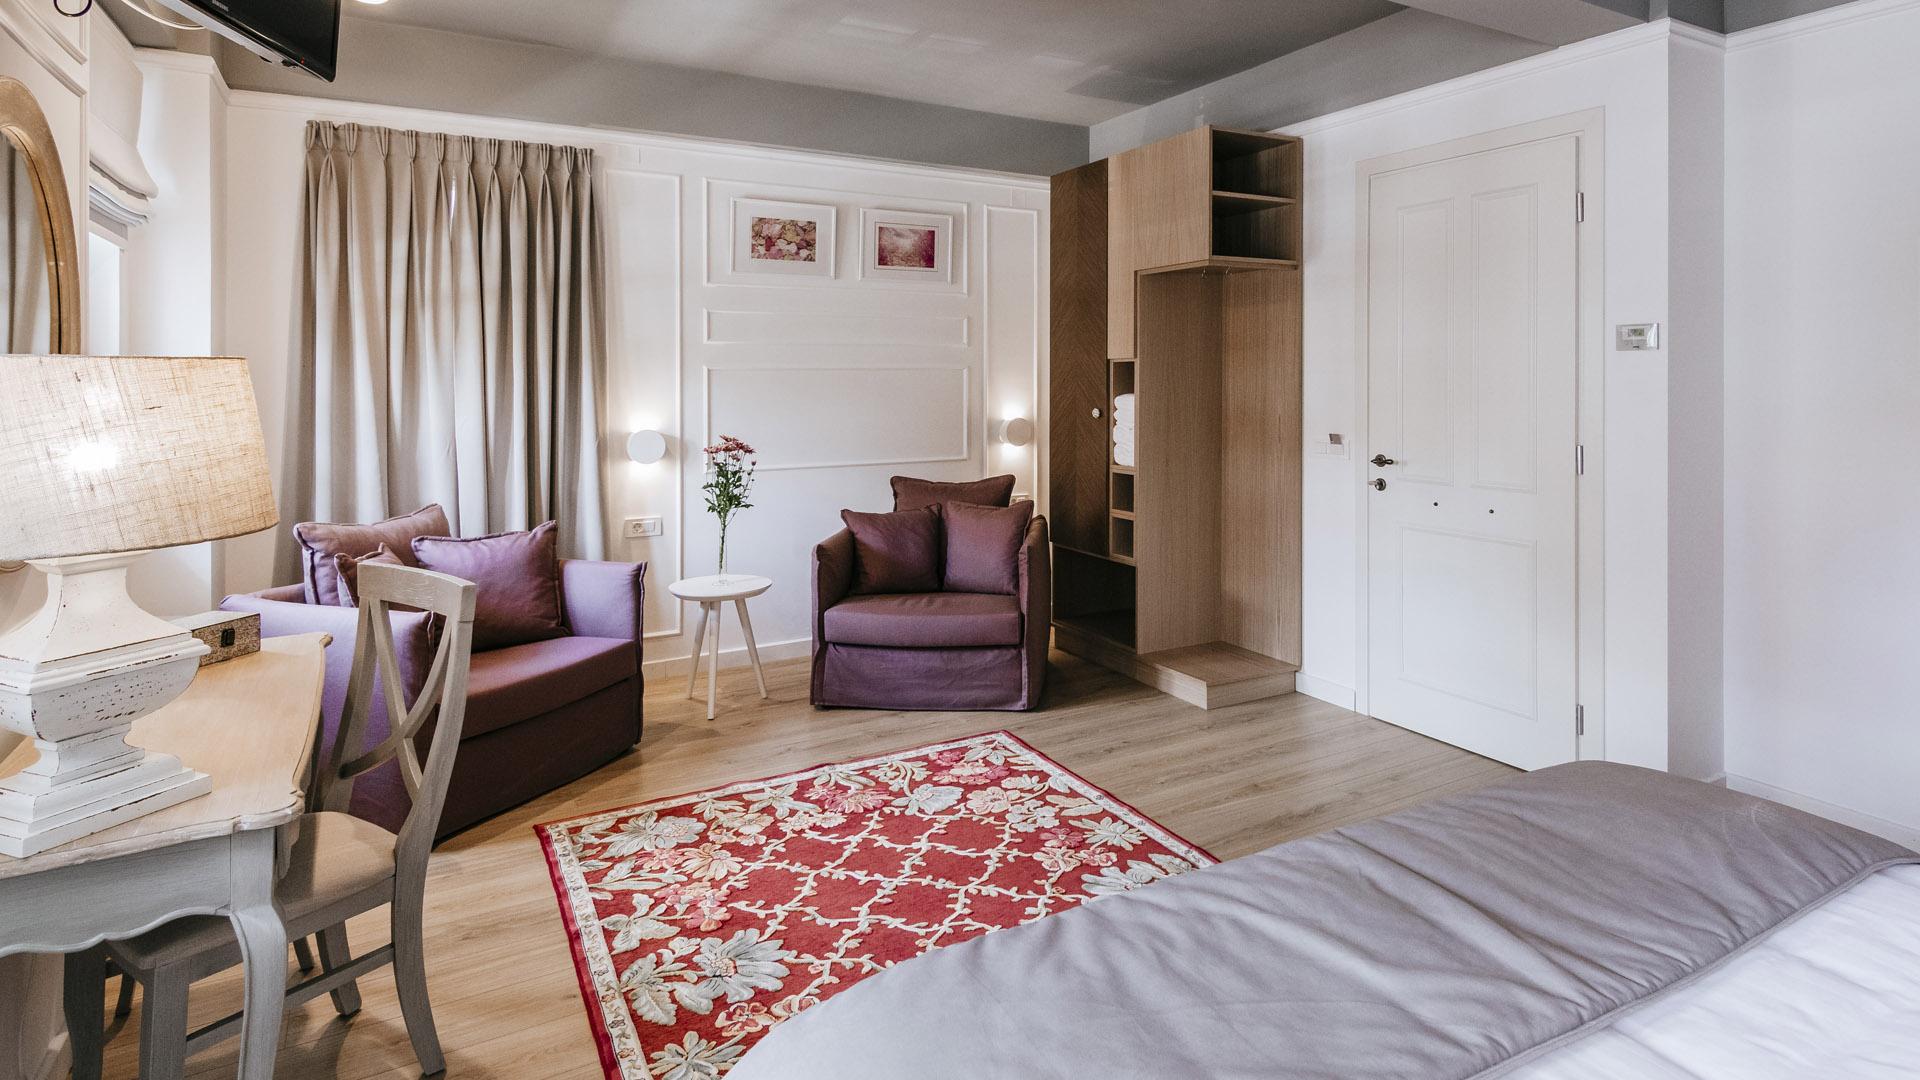 http://itskale-hotel.gr/demo/wp-content/uploads/2013/10/DSC_59781.jpg